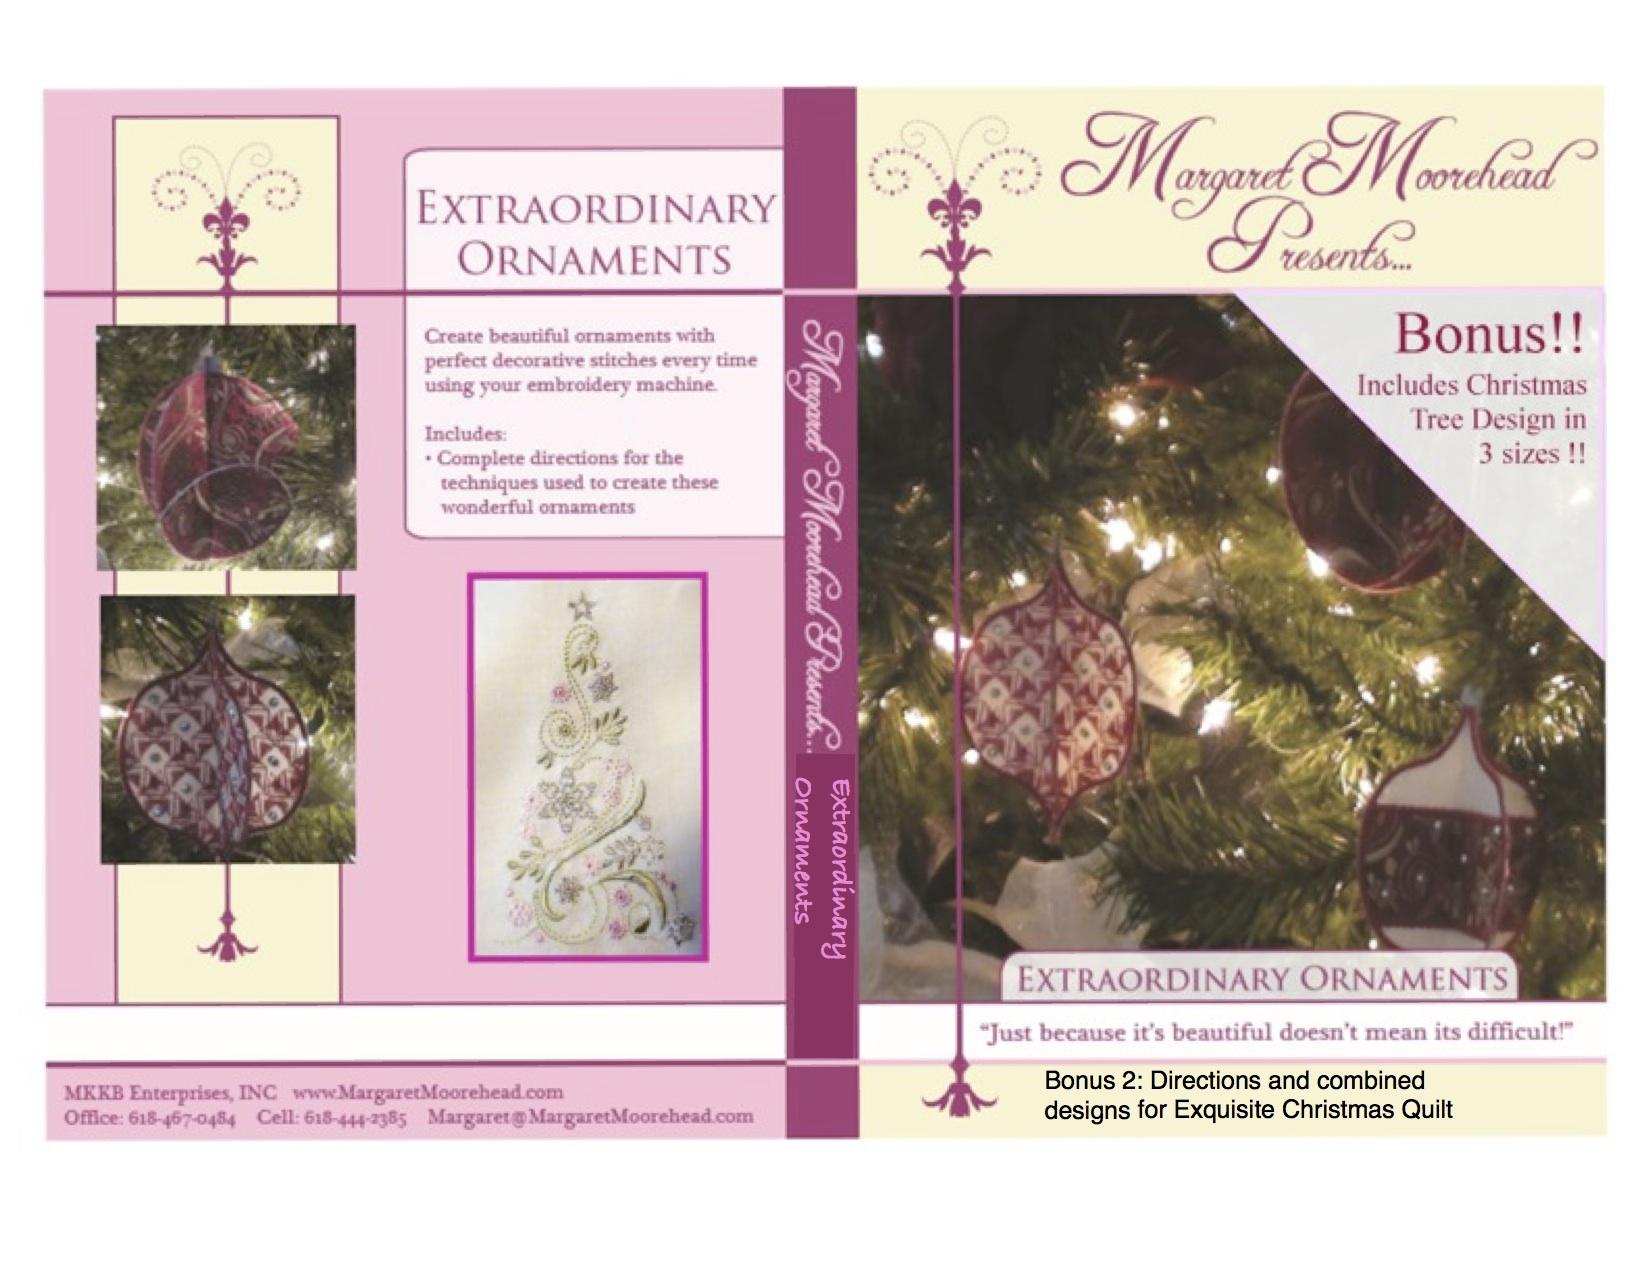 Extraordinary Ornaments